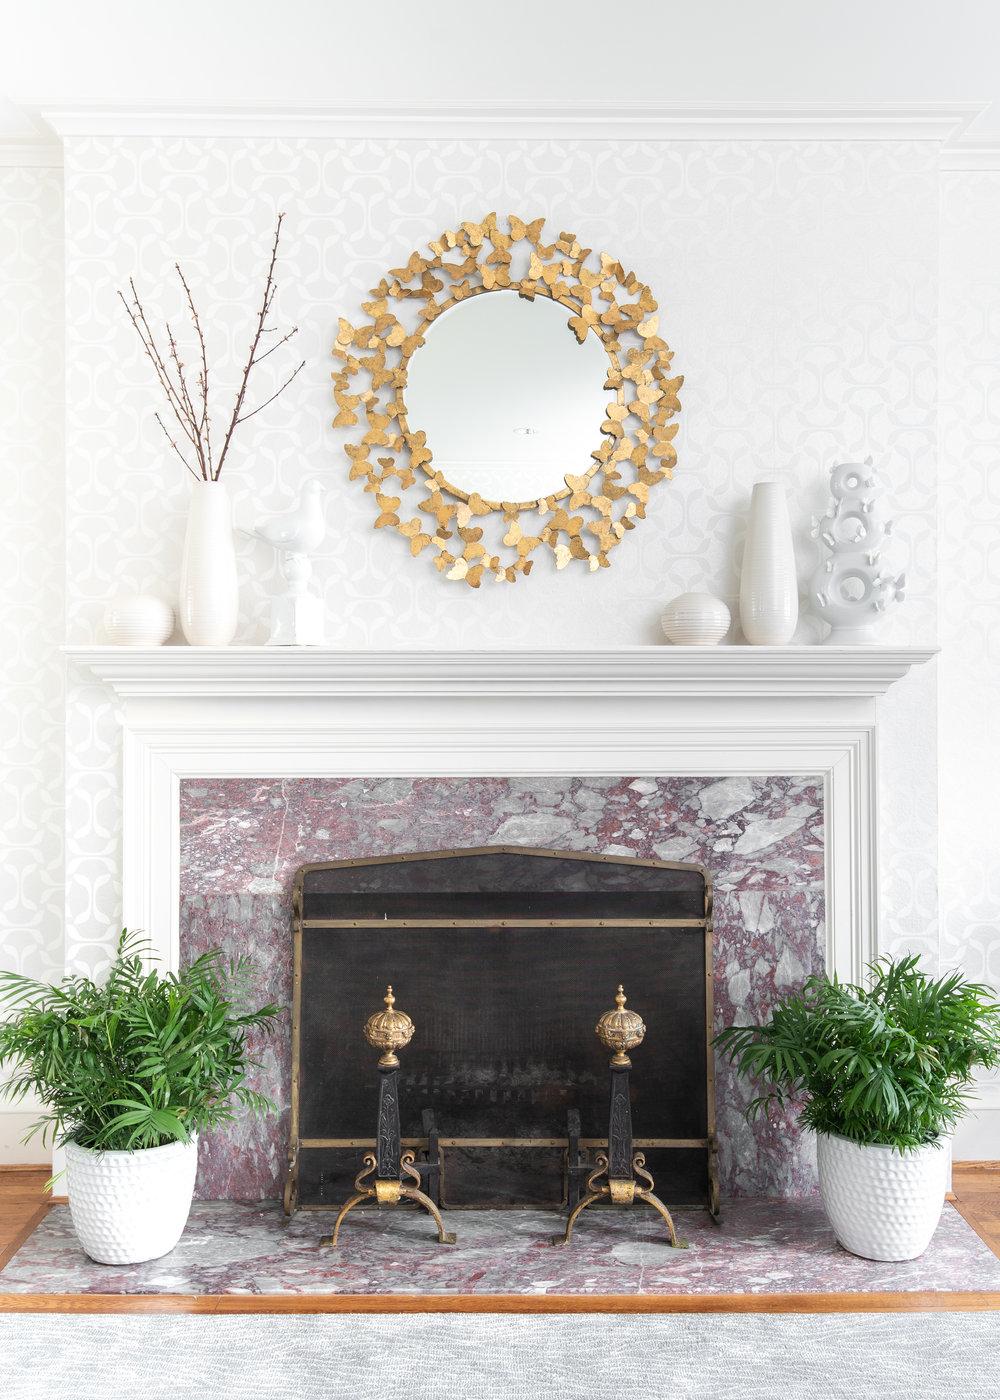 elegant-fireplace-mantle-all-white-decor-dc-interior-design-dmv-splendor-styling-mariella-cruzado.jpg